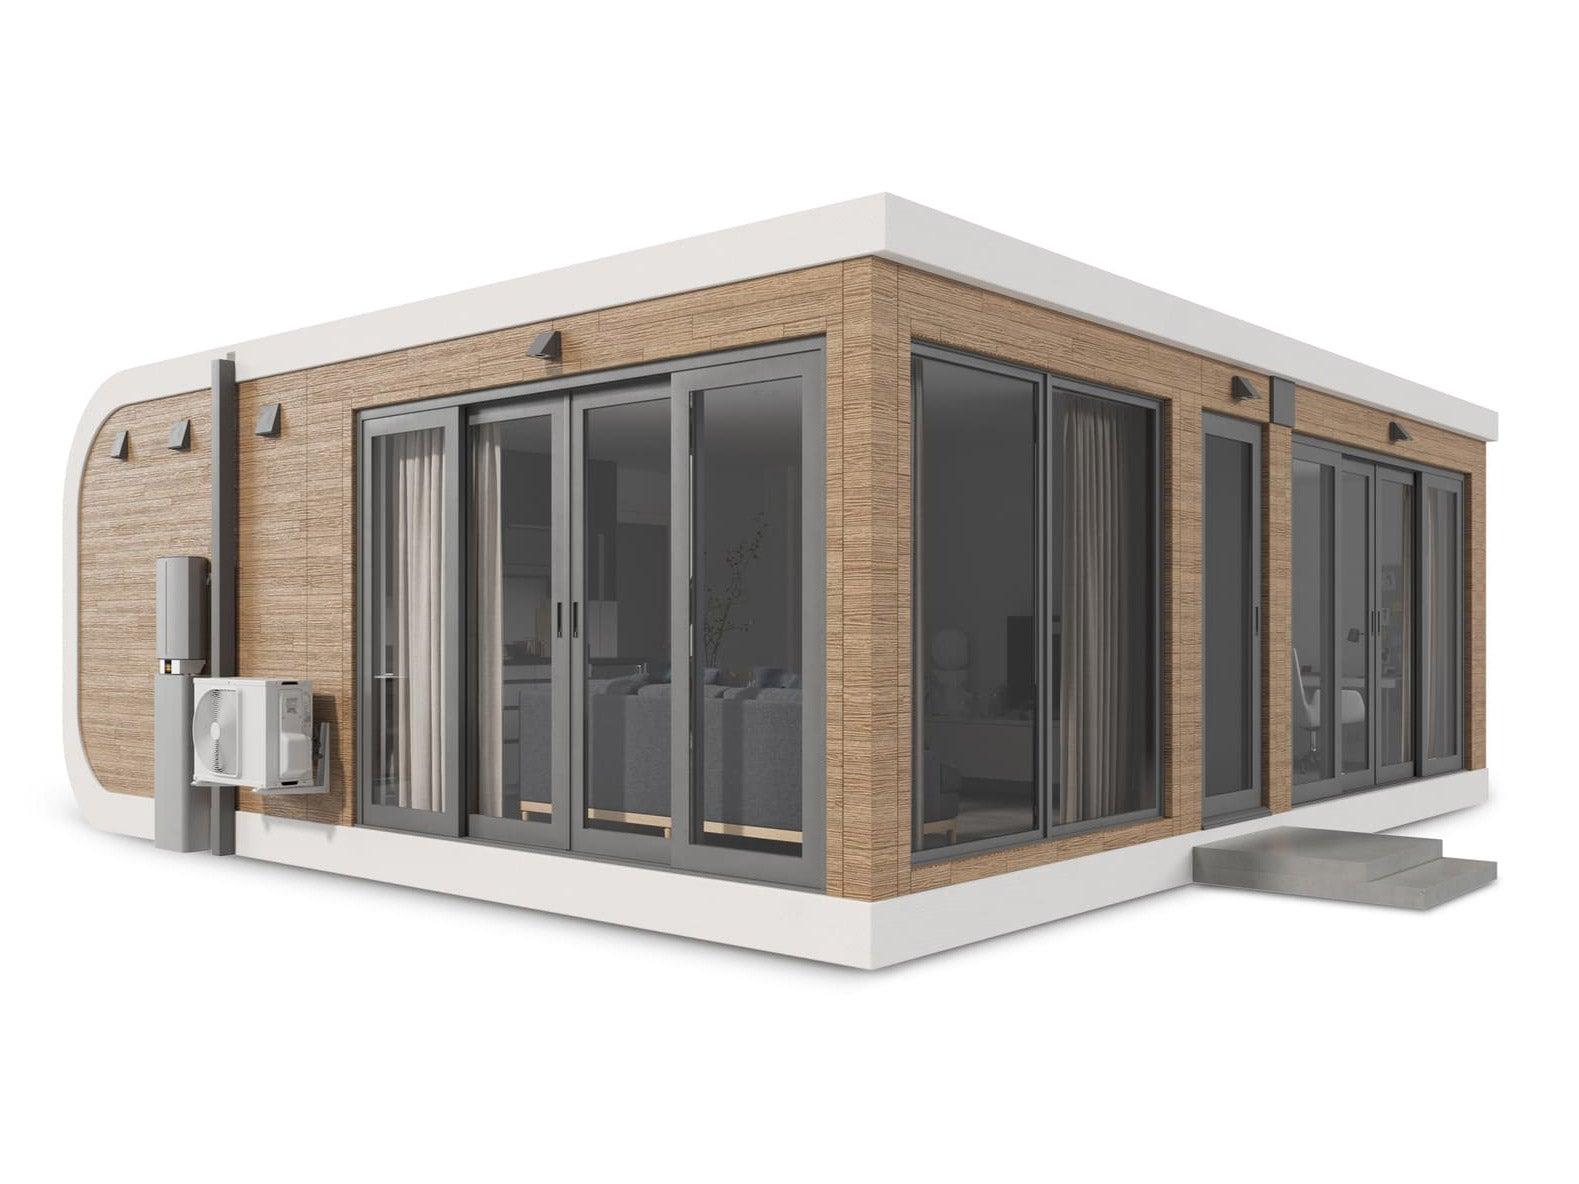 Mighty Studio Building 3D Printed